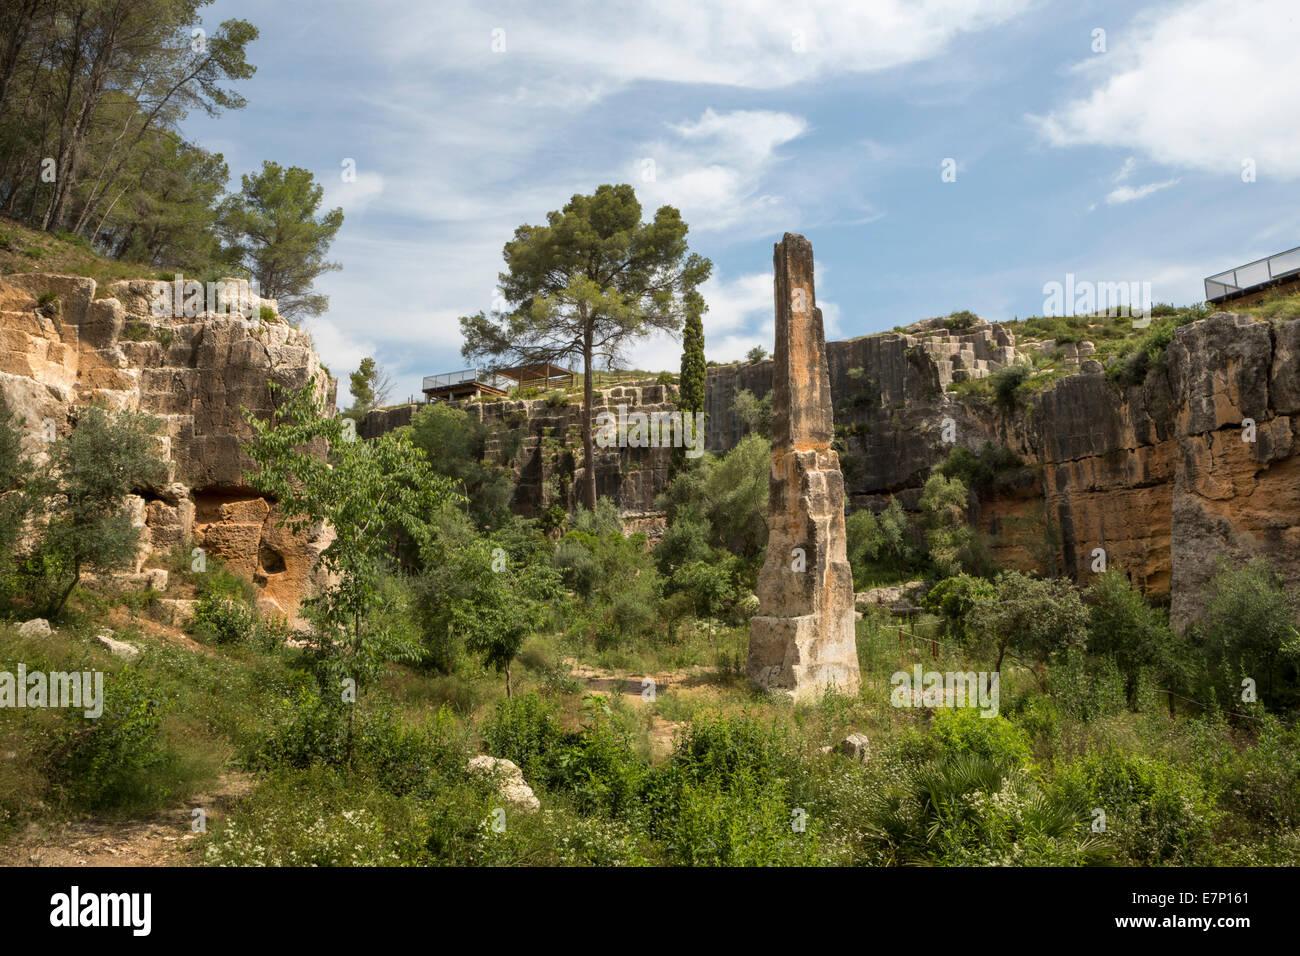 world heritage, El Medol, Catalonia, column, history, landscape, quarry, roman, Spain, Europe, stones, Tarragona, - Stock Image